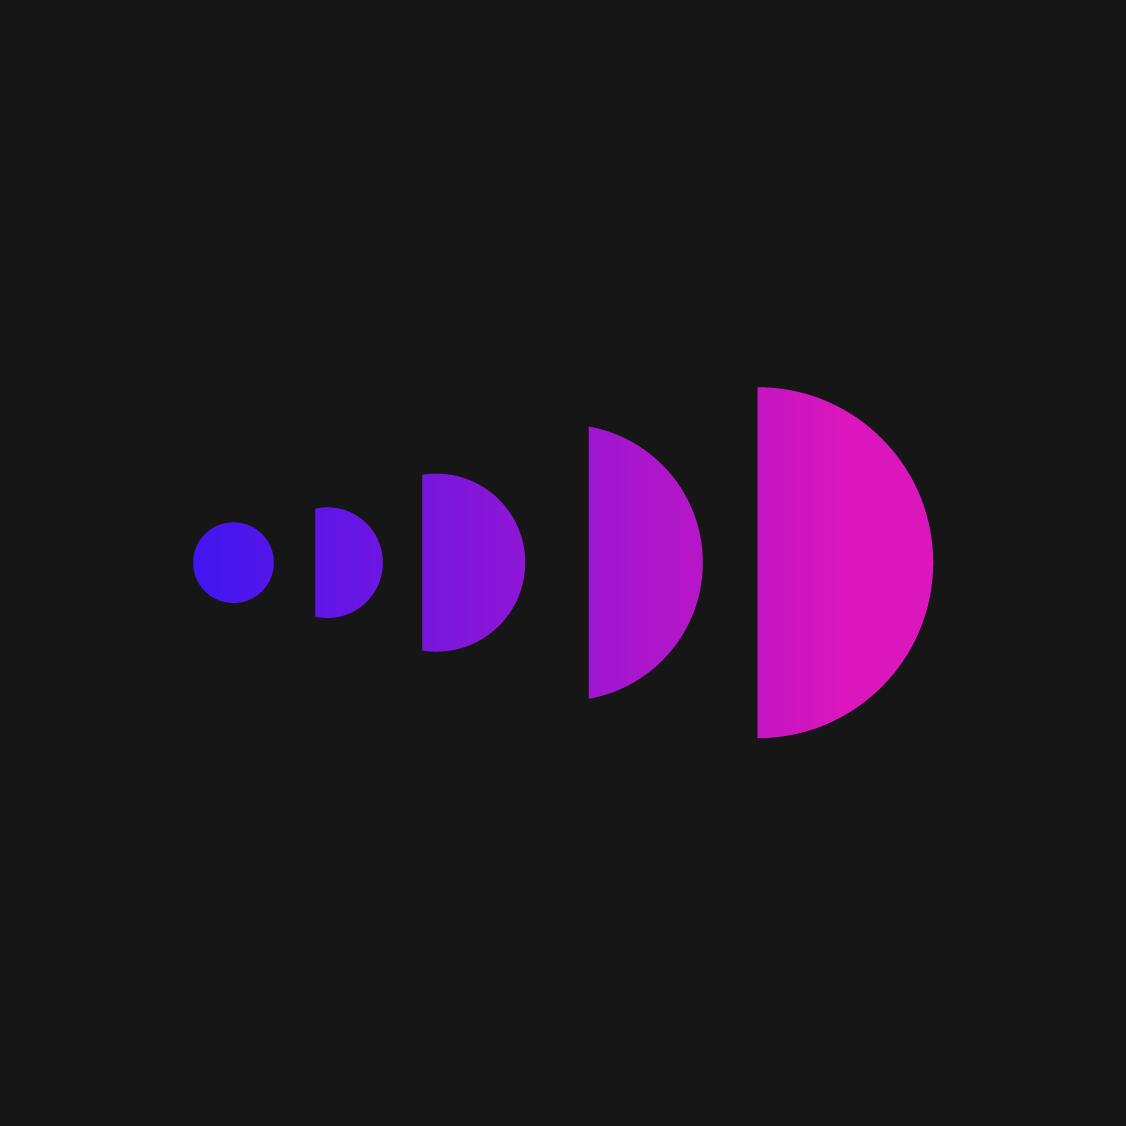 all-logos-2020-93